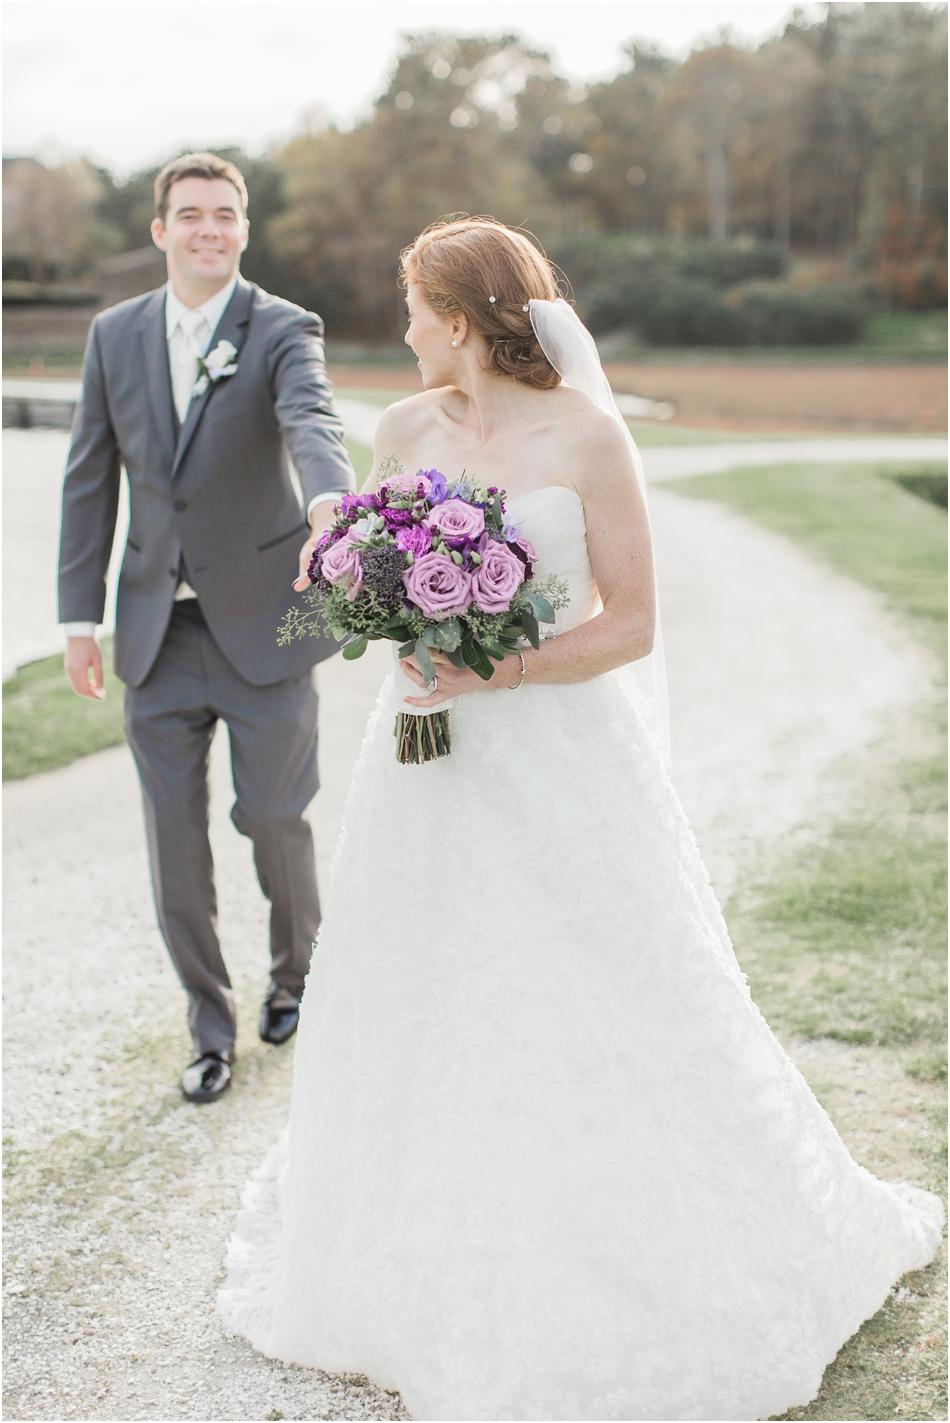 willowbend_megan_david_country_club_cape_cod_boston_new_england_wedding_photographer_Meredith_Jane_Photography_photo_0207.jpg